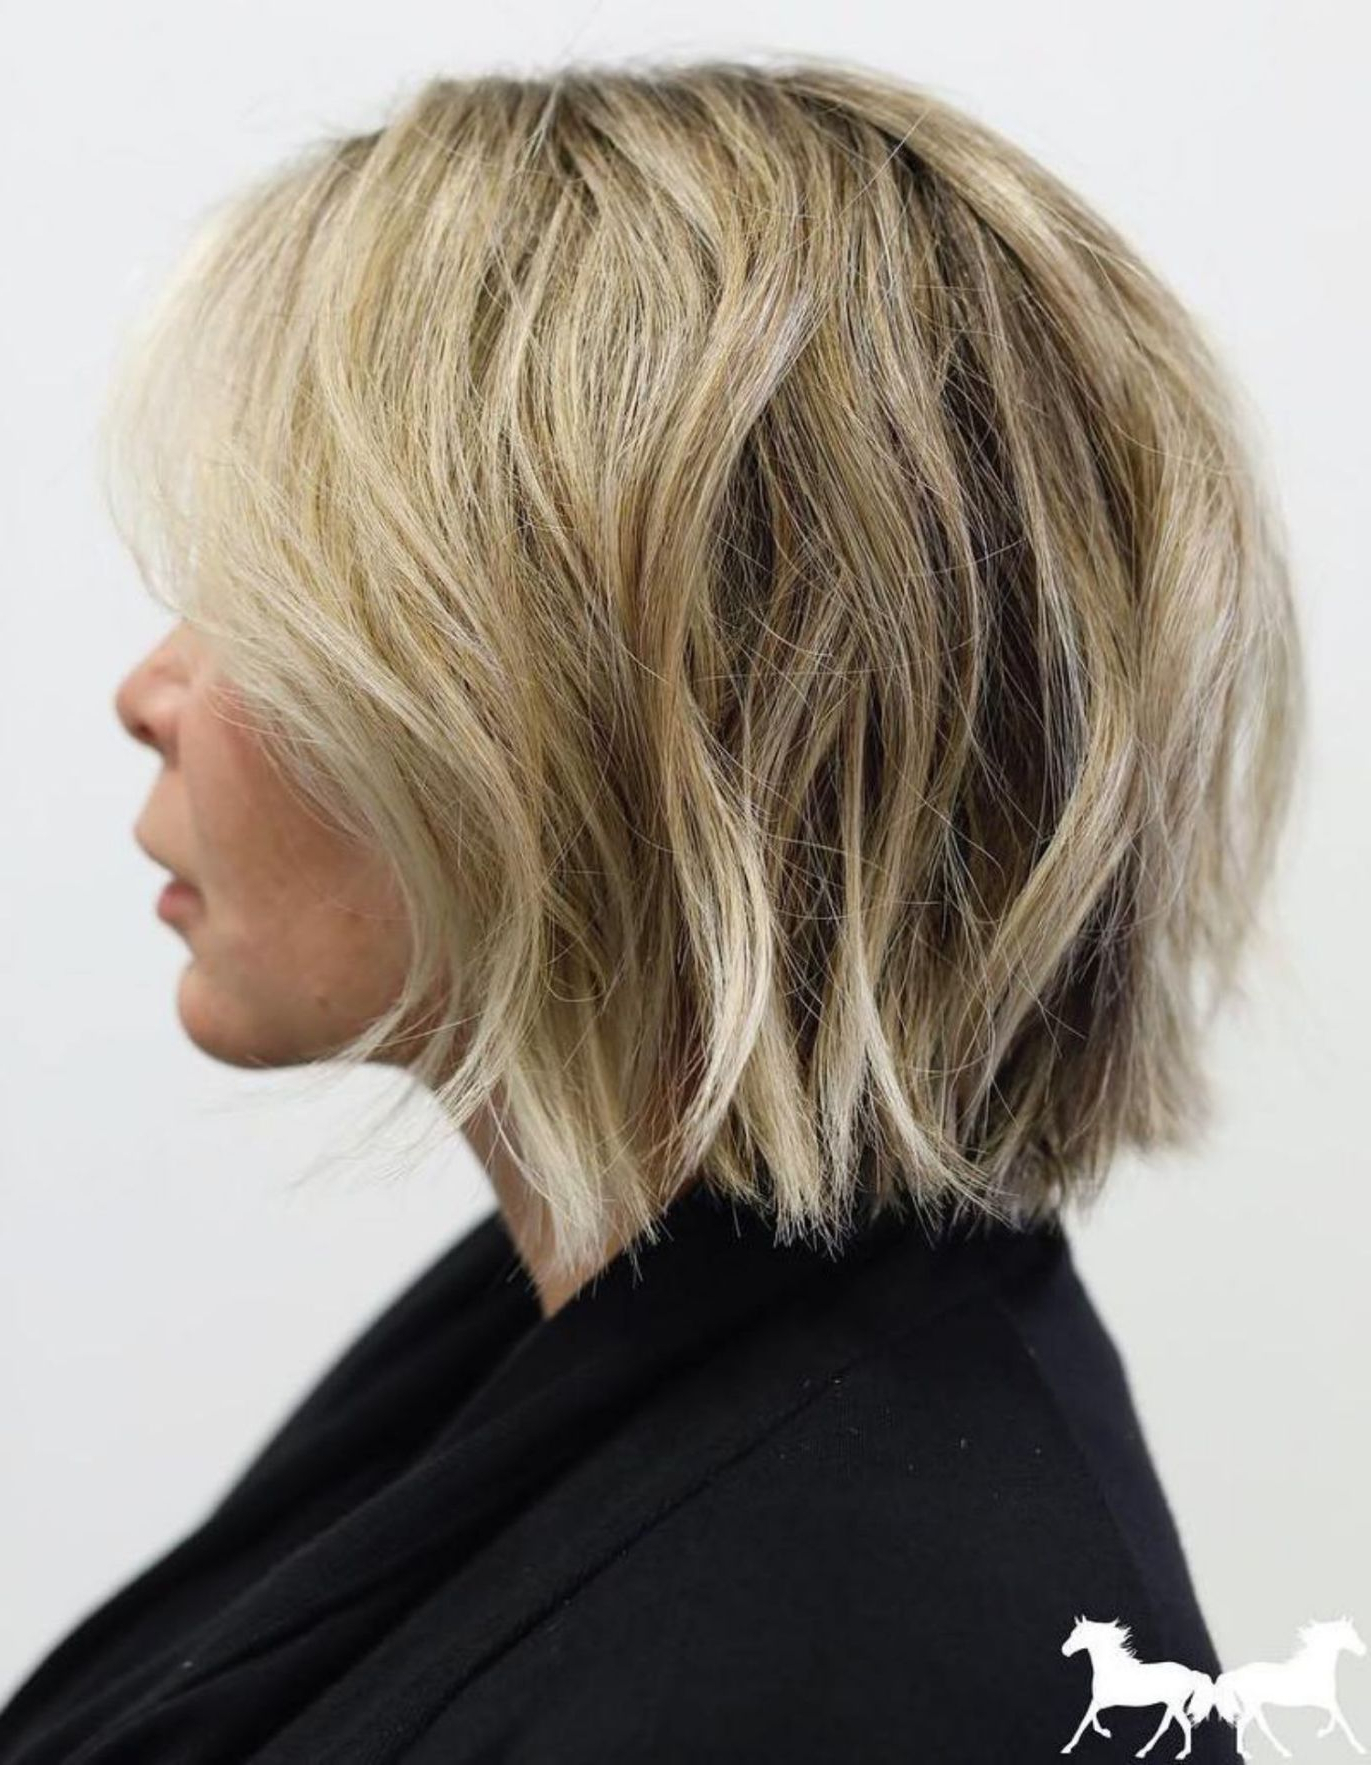 70 Fabulous Choppy Bob Hairstyles | Hair | Pinterest | Choppy Bob Within Tousled Wavy Blonde Bob Hairstyles (Gallery 19 of 25)